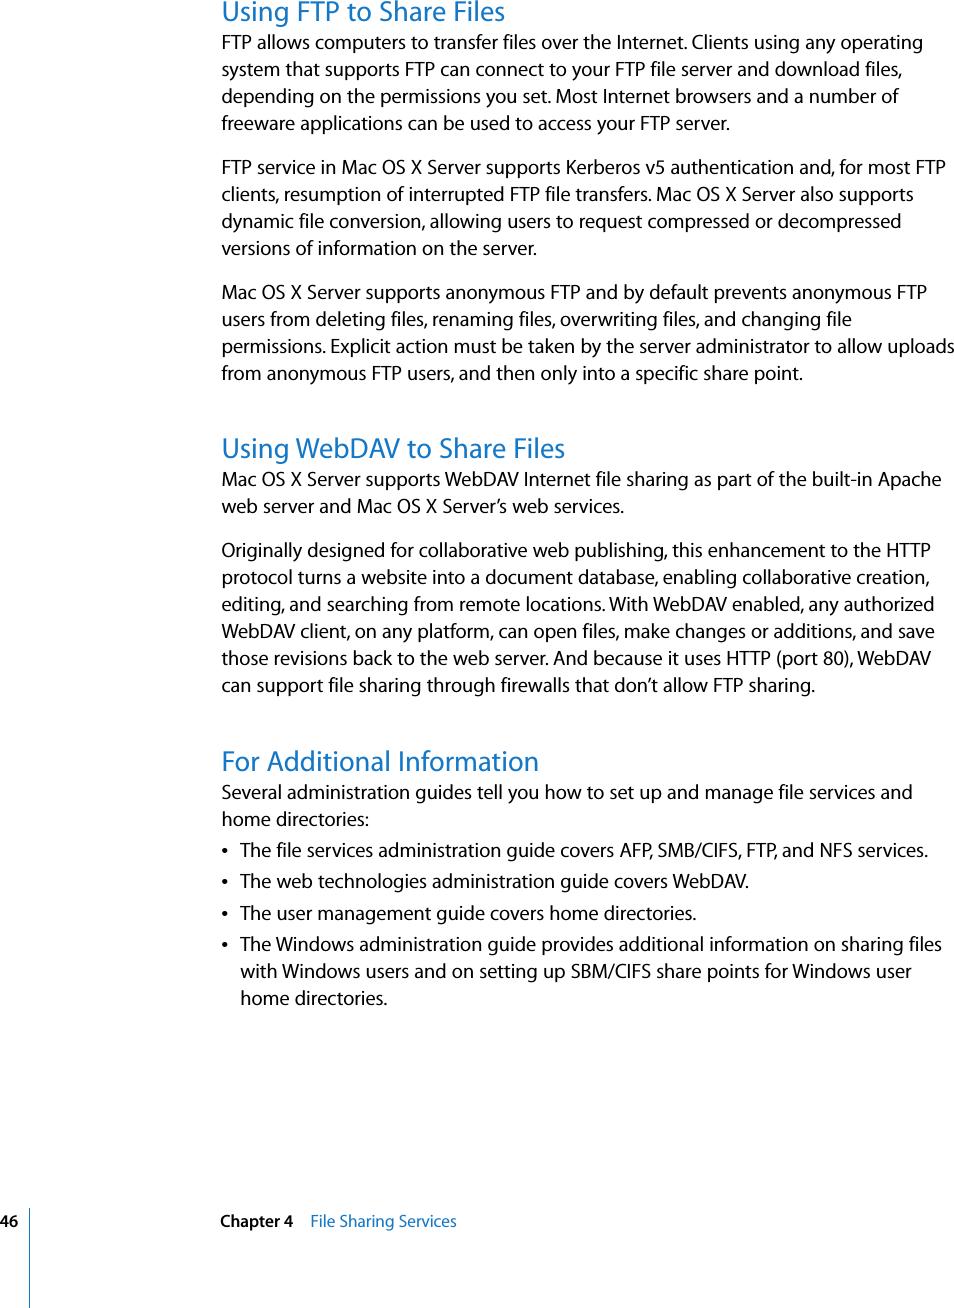 Apple MacOSXServer Mac OS X Server Collaboration Services